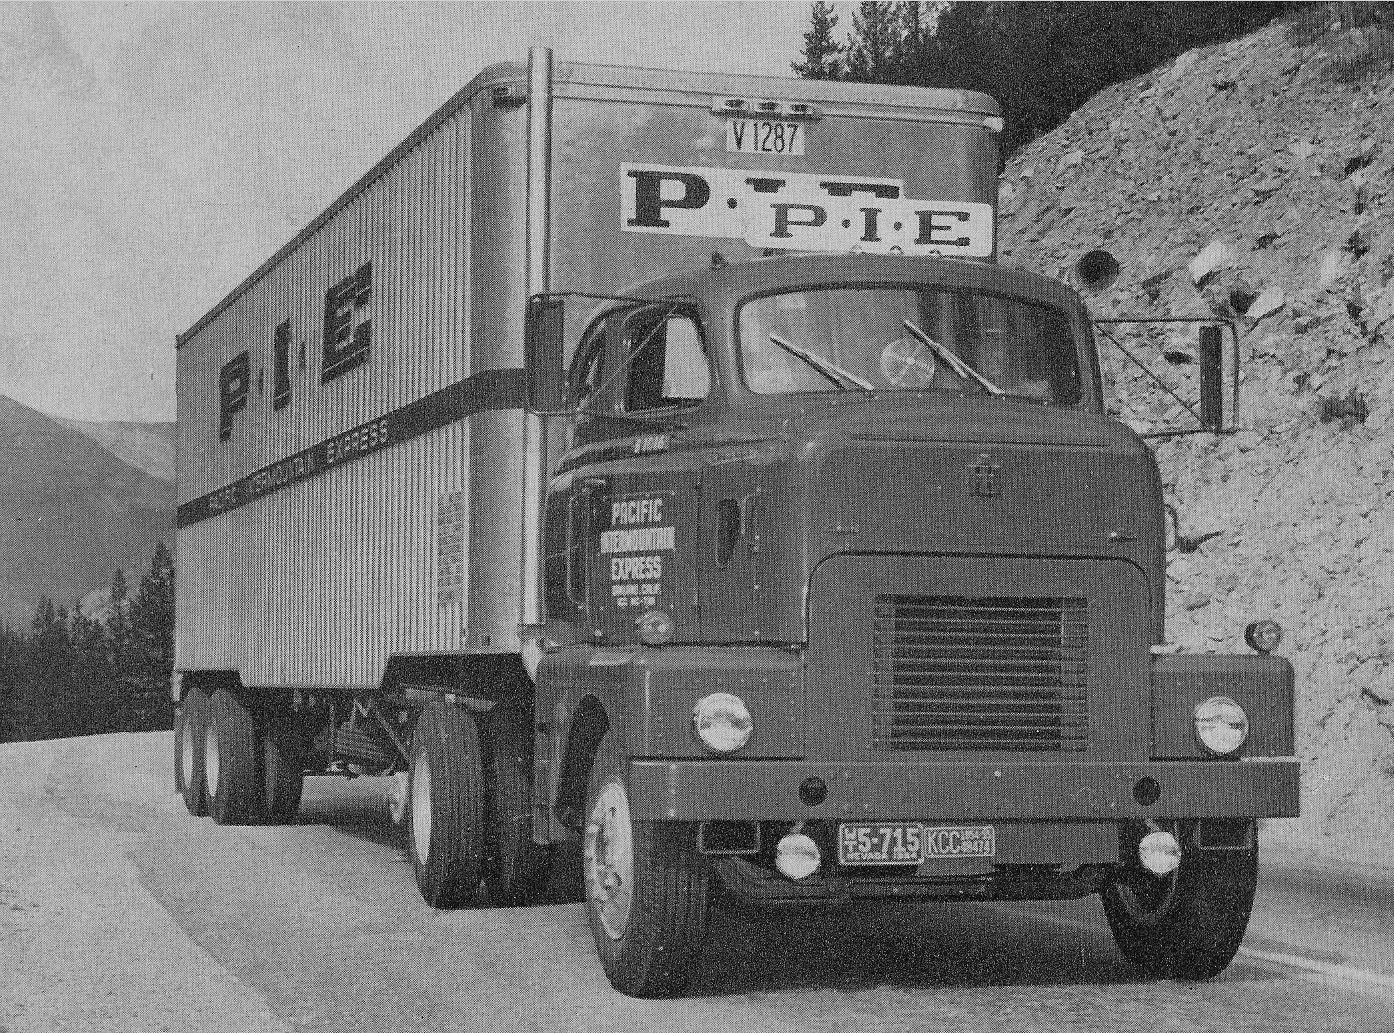 1955 Ih Dc 405 L Pie International Truck Vintage Trucks Trucking Companies